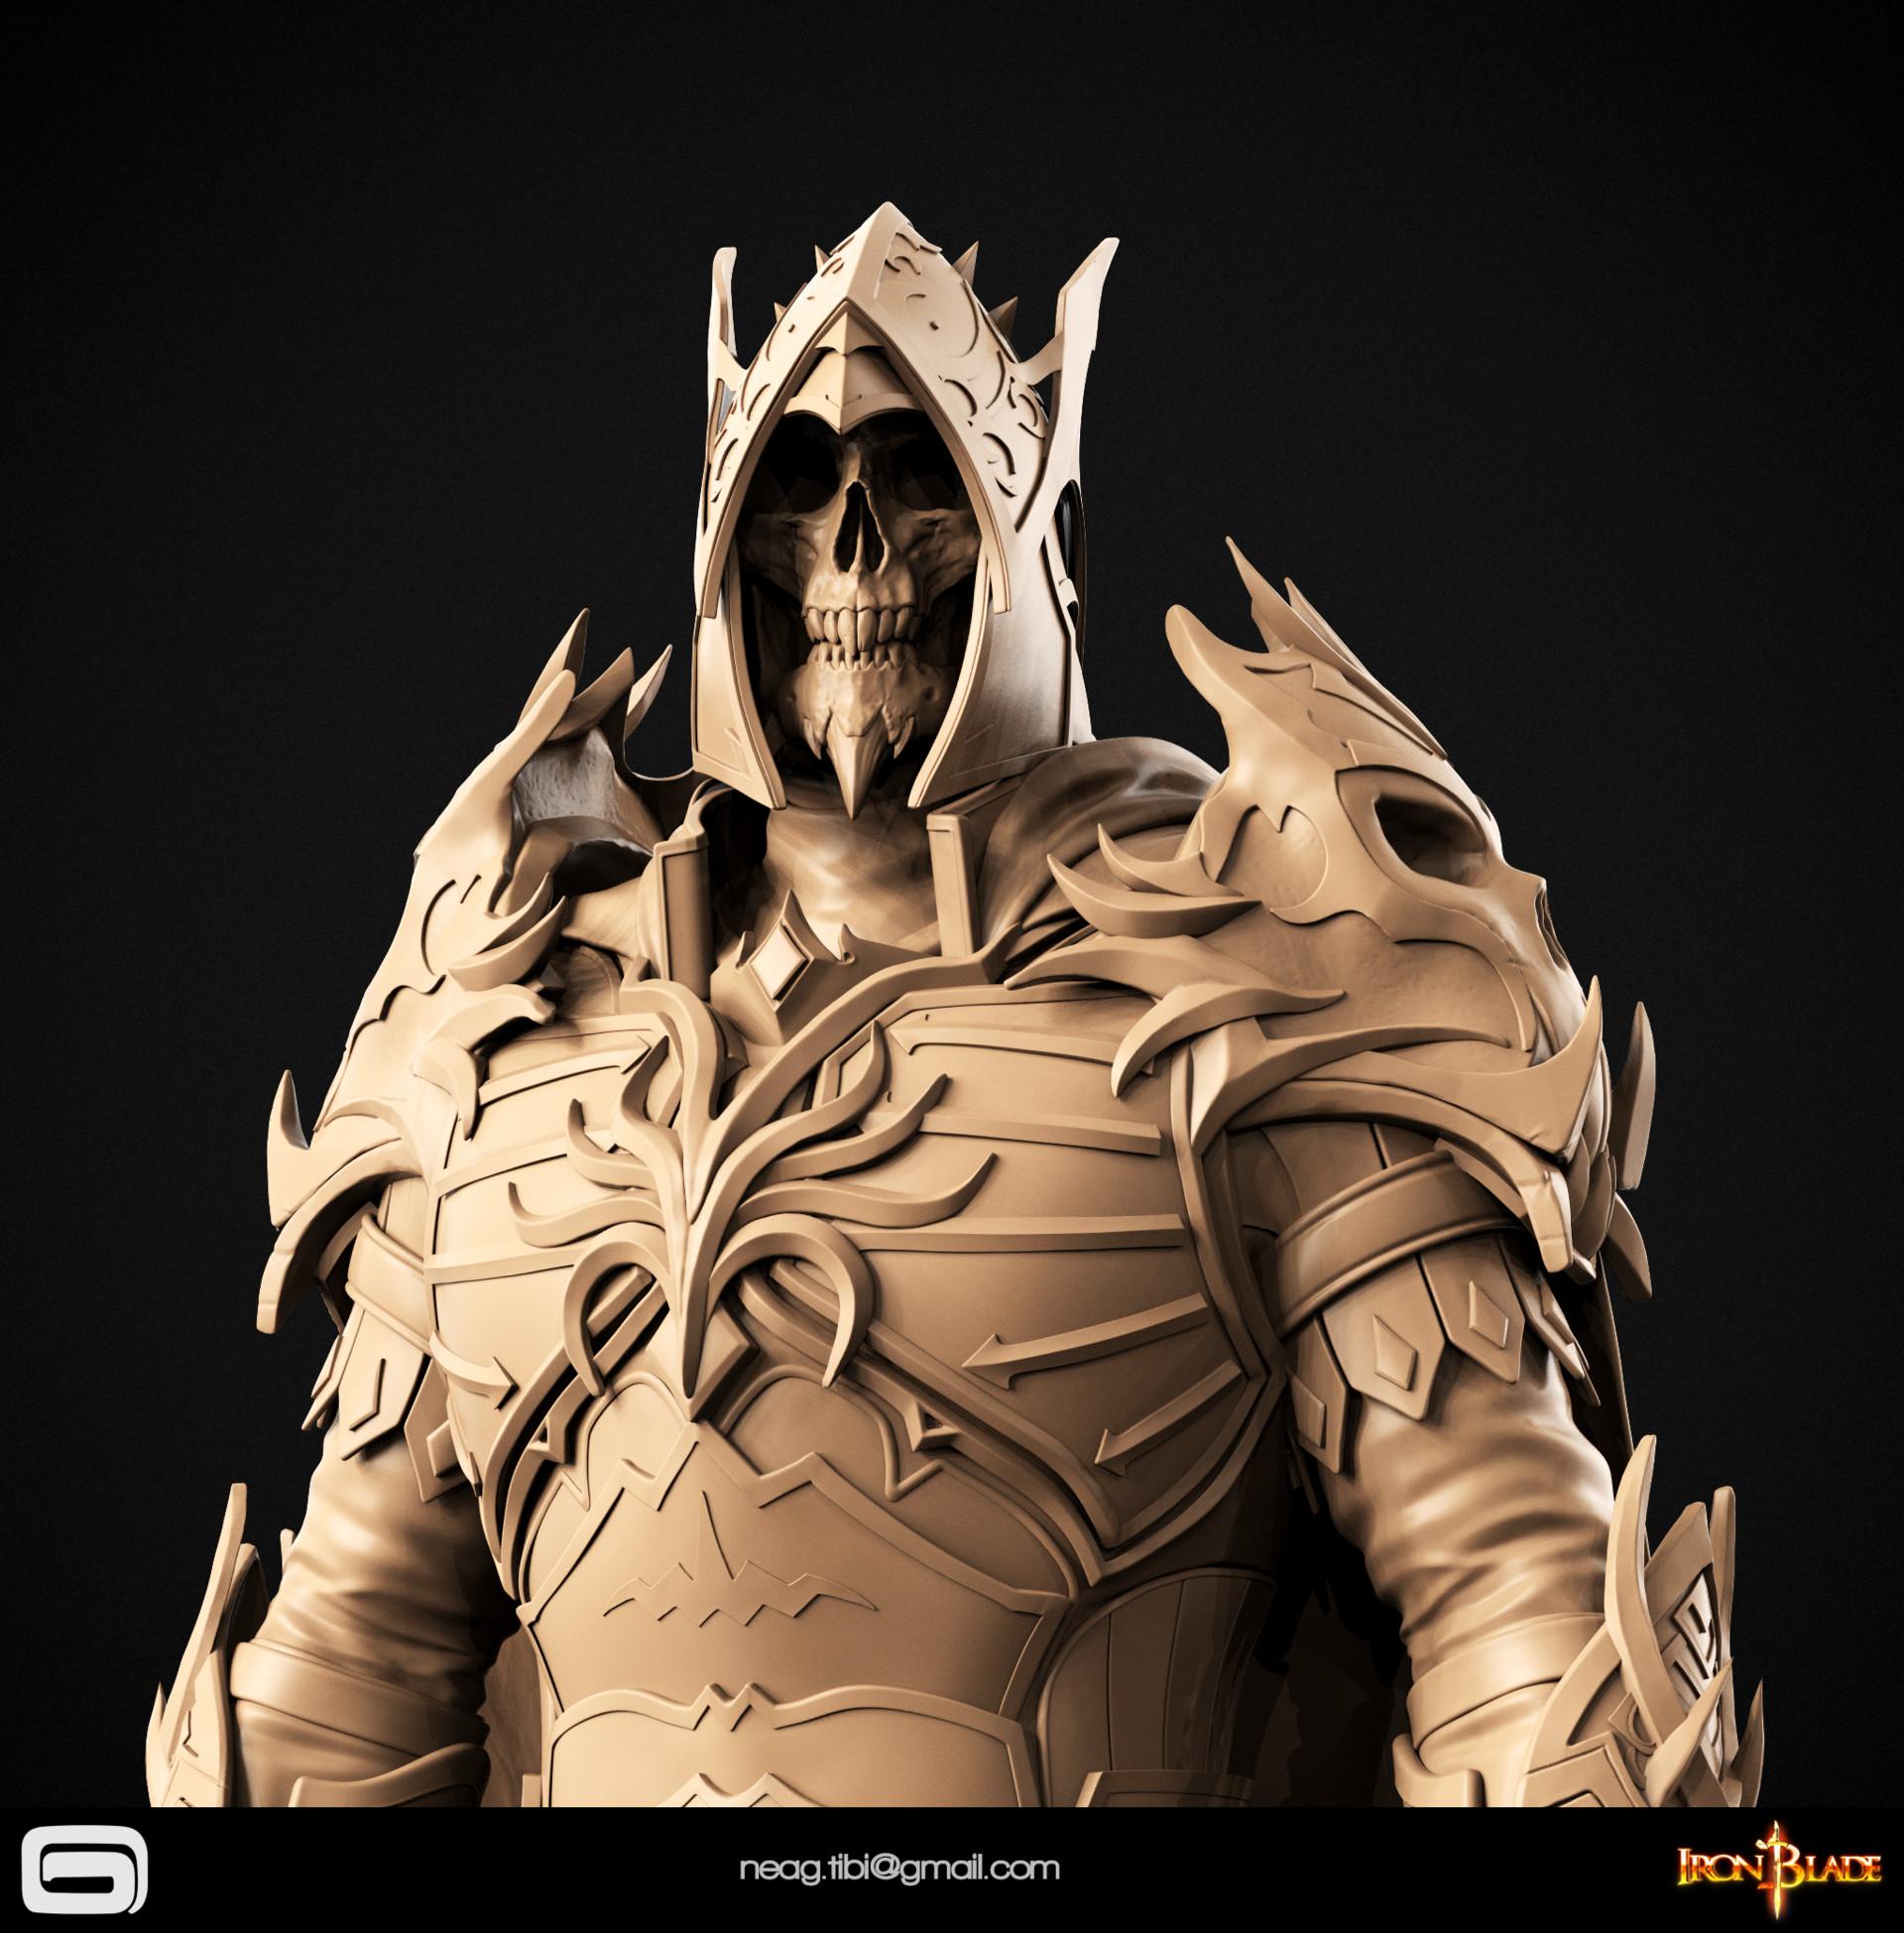 Tibi neag tibi neag death reaper 2 high 03